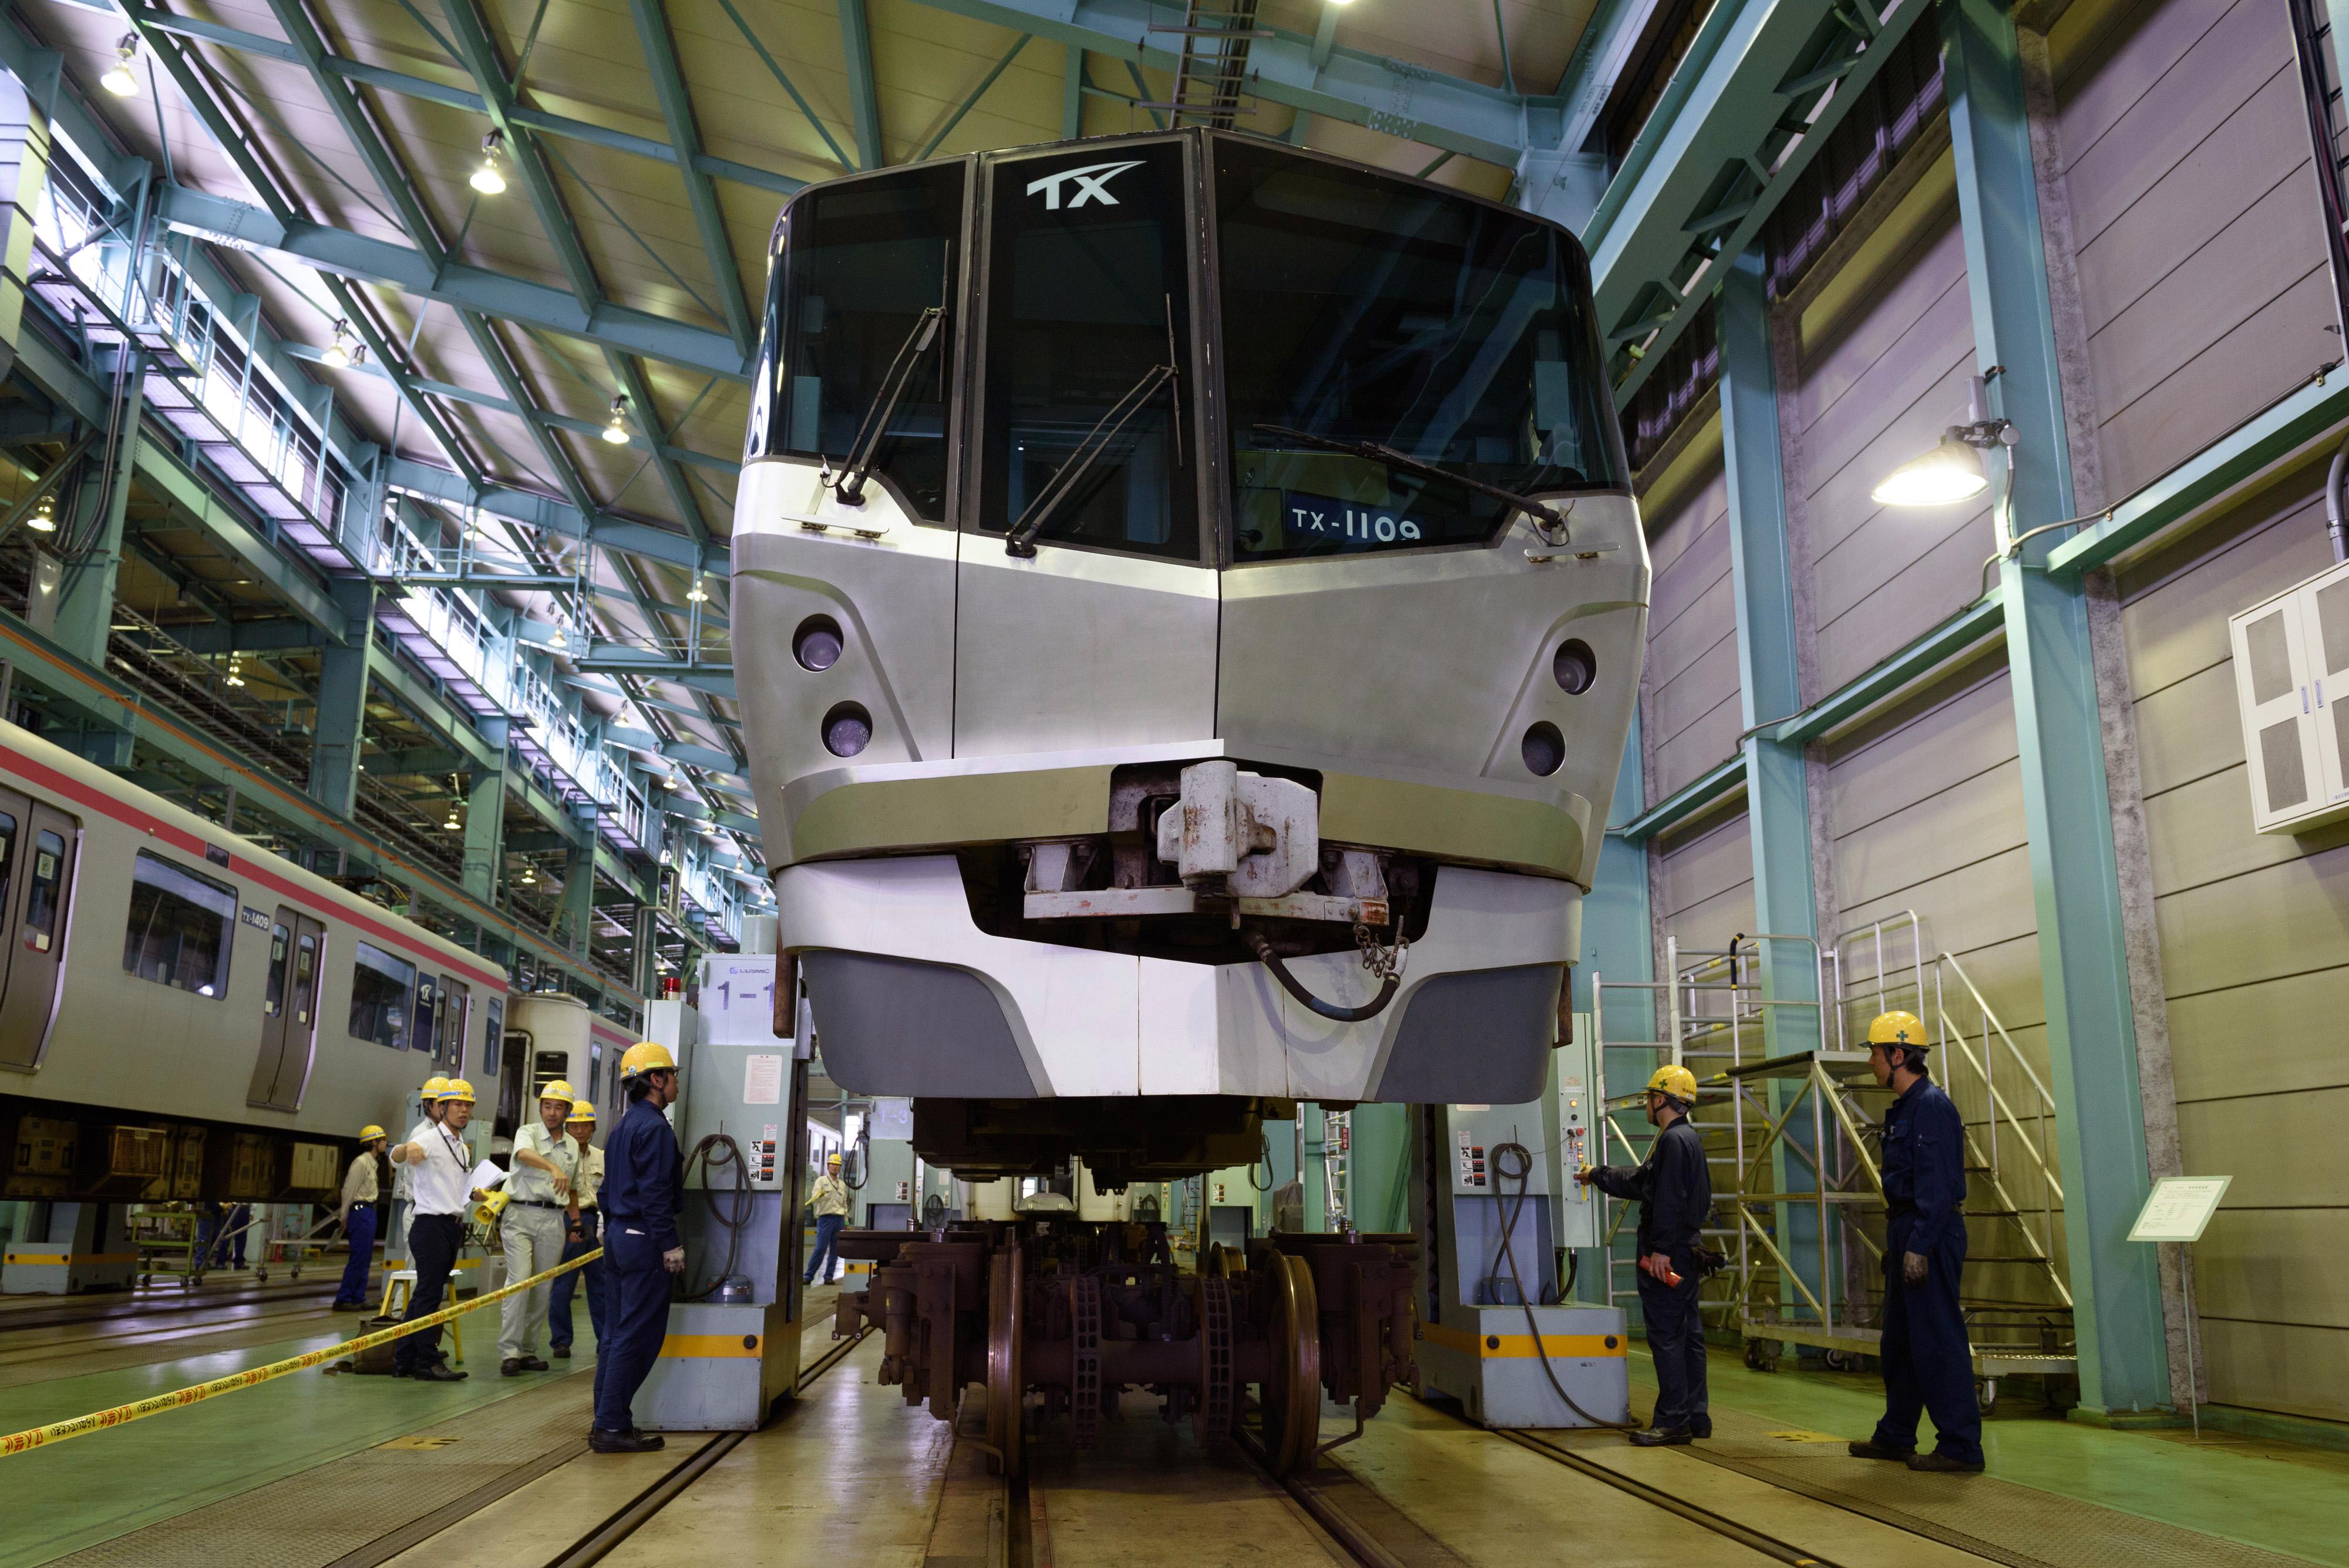 A Tsukuba Express TX-1000 series train